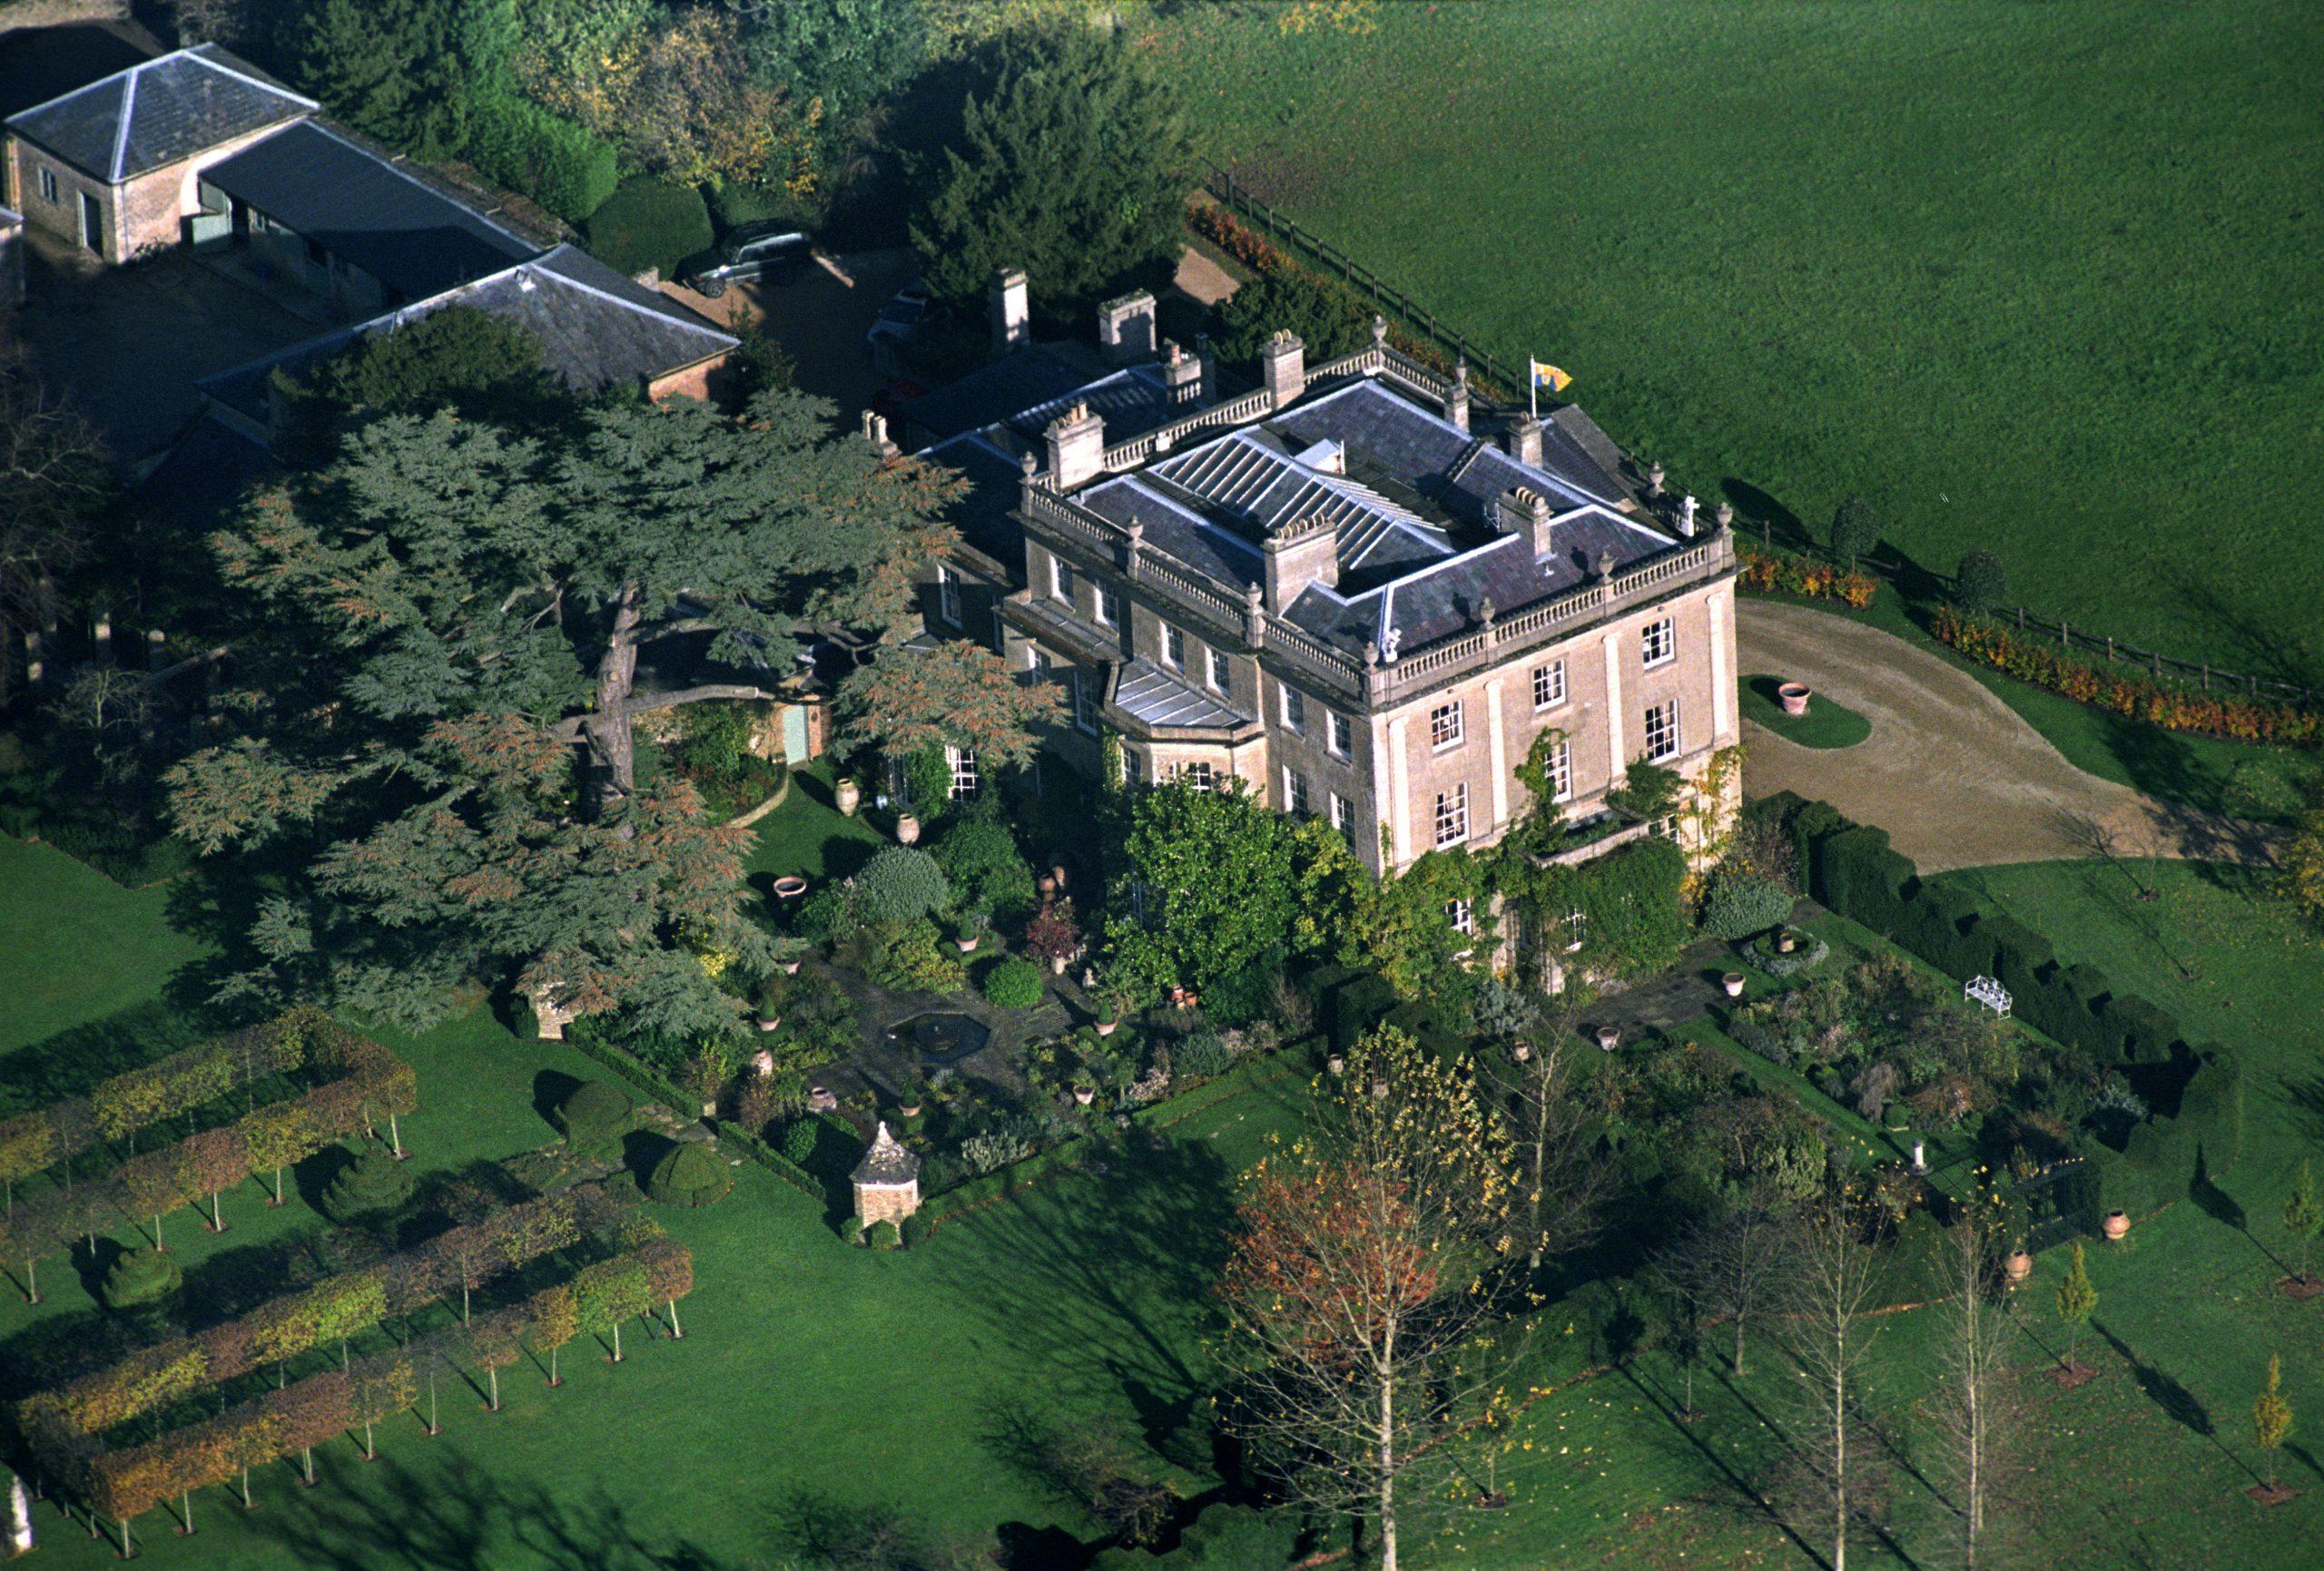 Résidence du Prince Charles et de Camilla Highgrove House